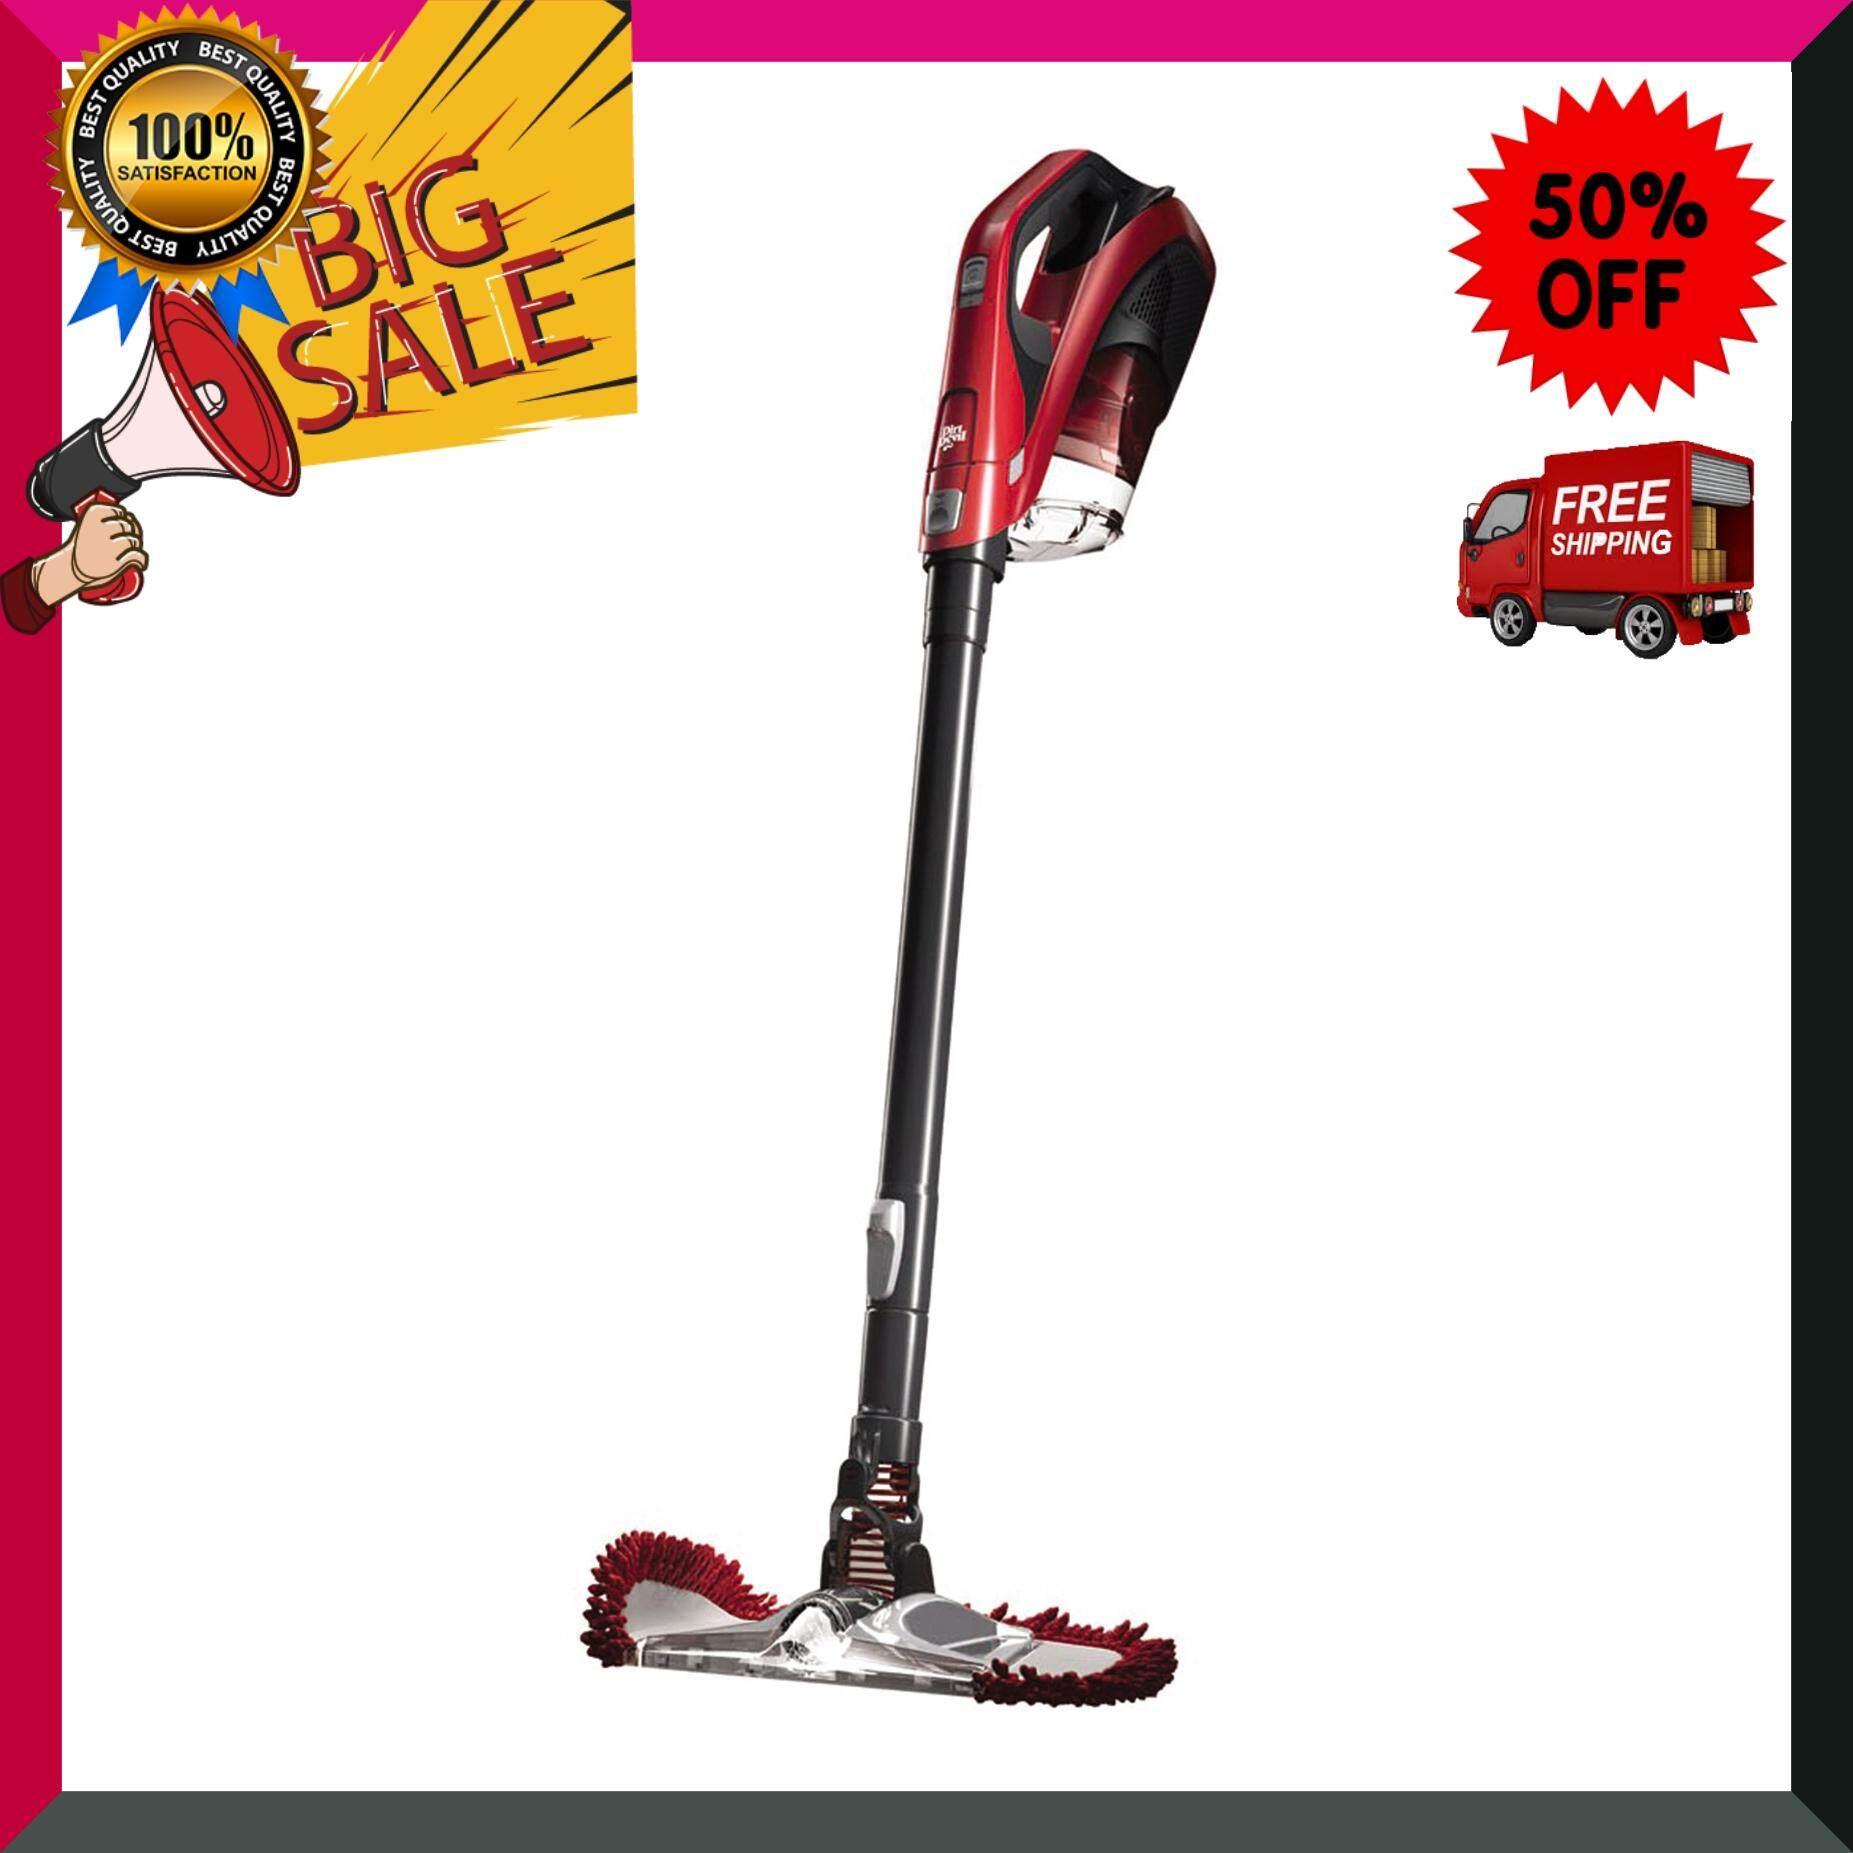 DIRT DEVIL เครื่องดูดฝุ่นไซโคล รุ่น DSV360THA สีแดง เครื่องดูดฝุ่น เครื่องทำความสะอาด เครื่องดูดฝุ่นอัตโนมัติ หุ่นยนต์ดูดฝุ่น Vacuum Cleaner สินค้าคุณภาพ Premium ***จัดส่งฟรี***